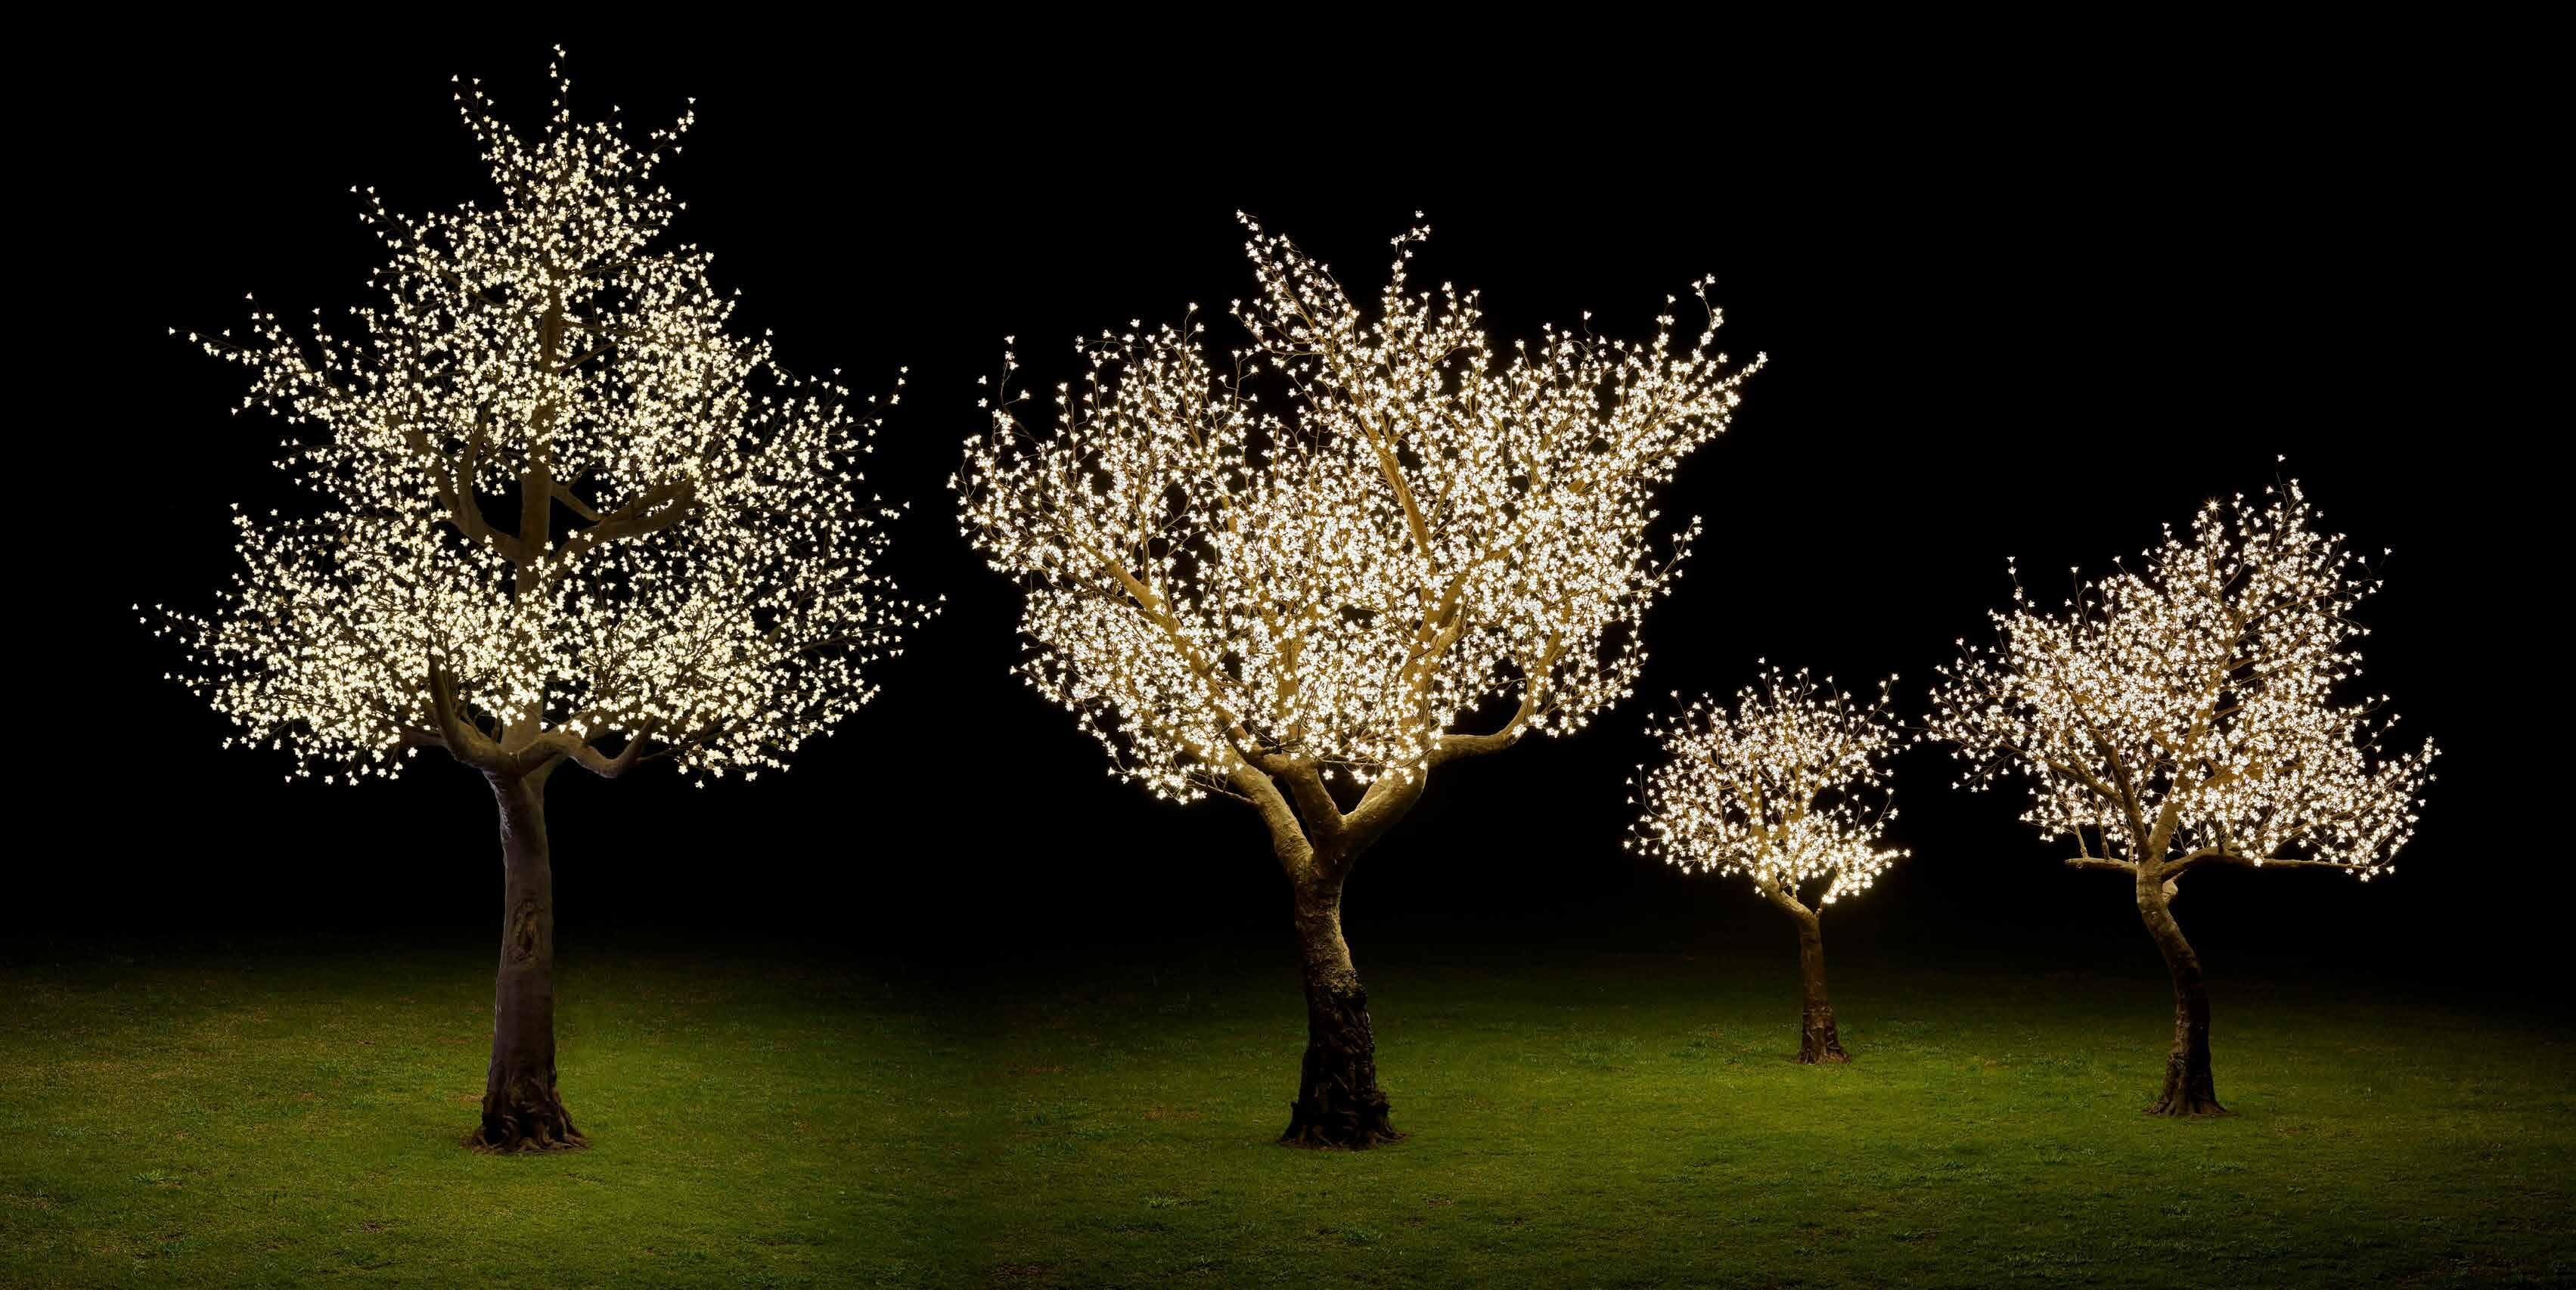 Bäume mit LED-Leuchten